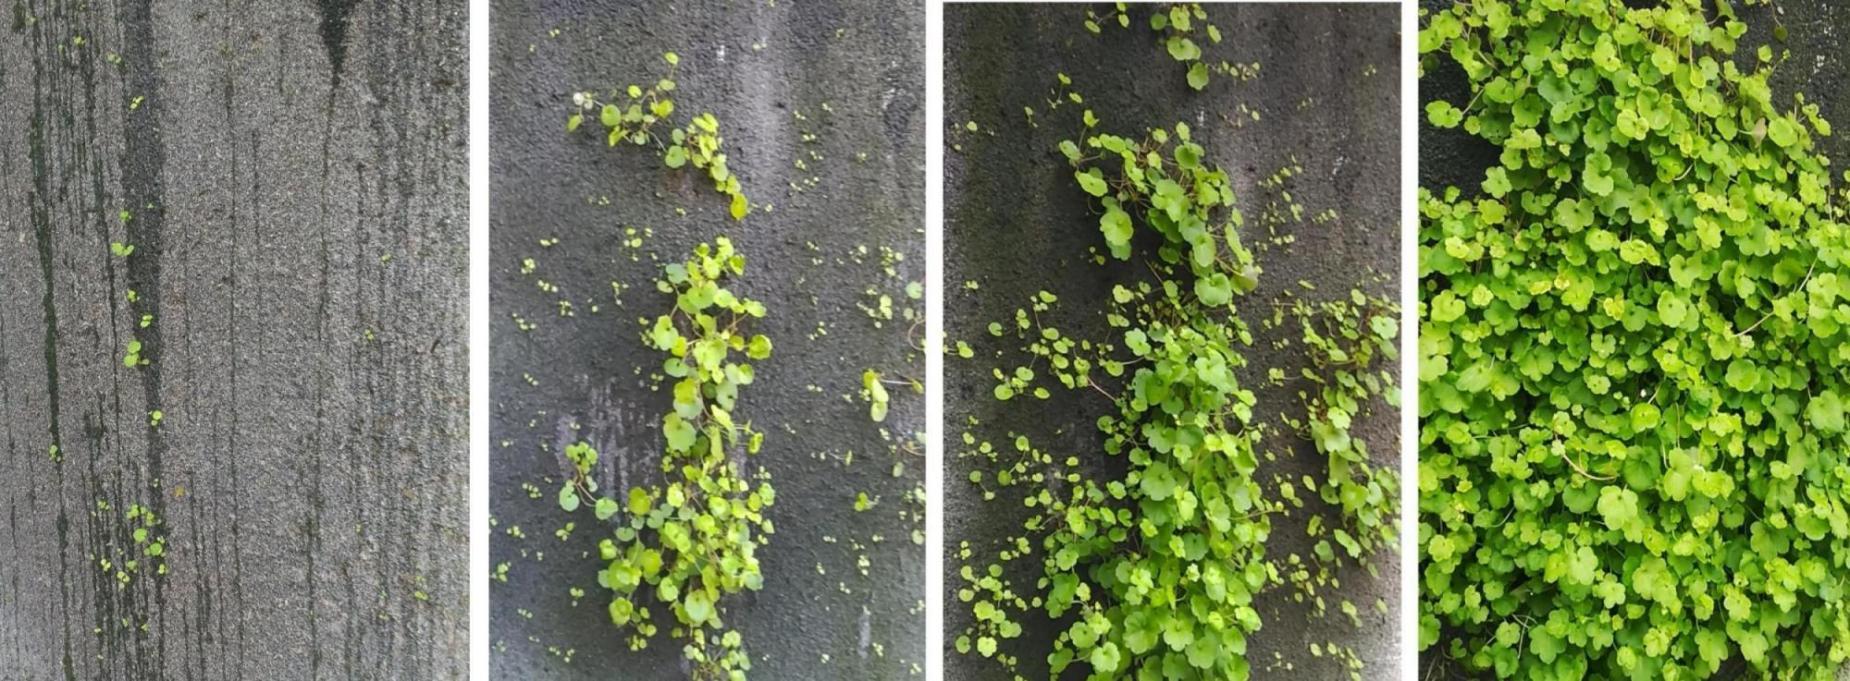 Crecimiento de Jardín Vertical LeafSkin